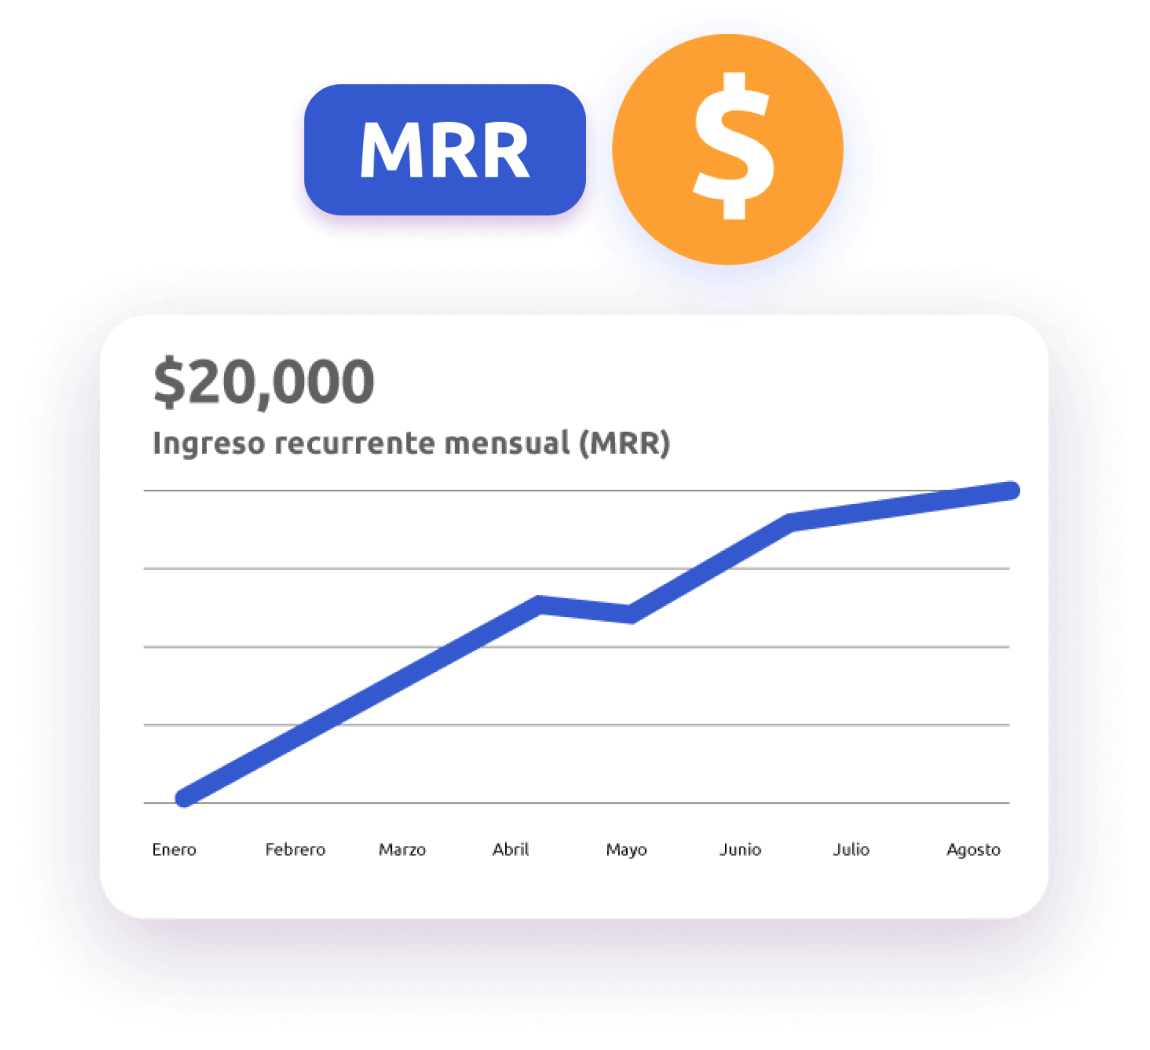 Ilustración: MRR Montly Recurring Revenue.